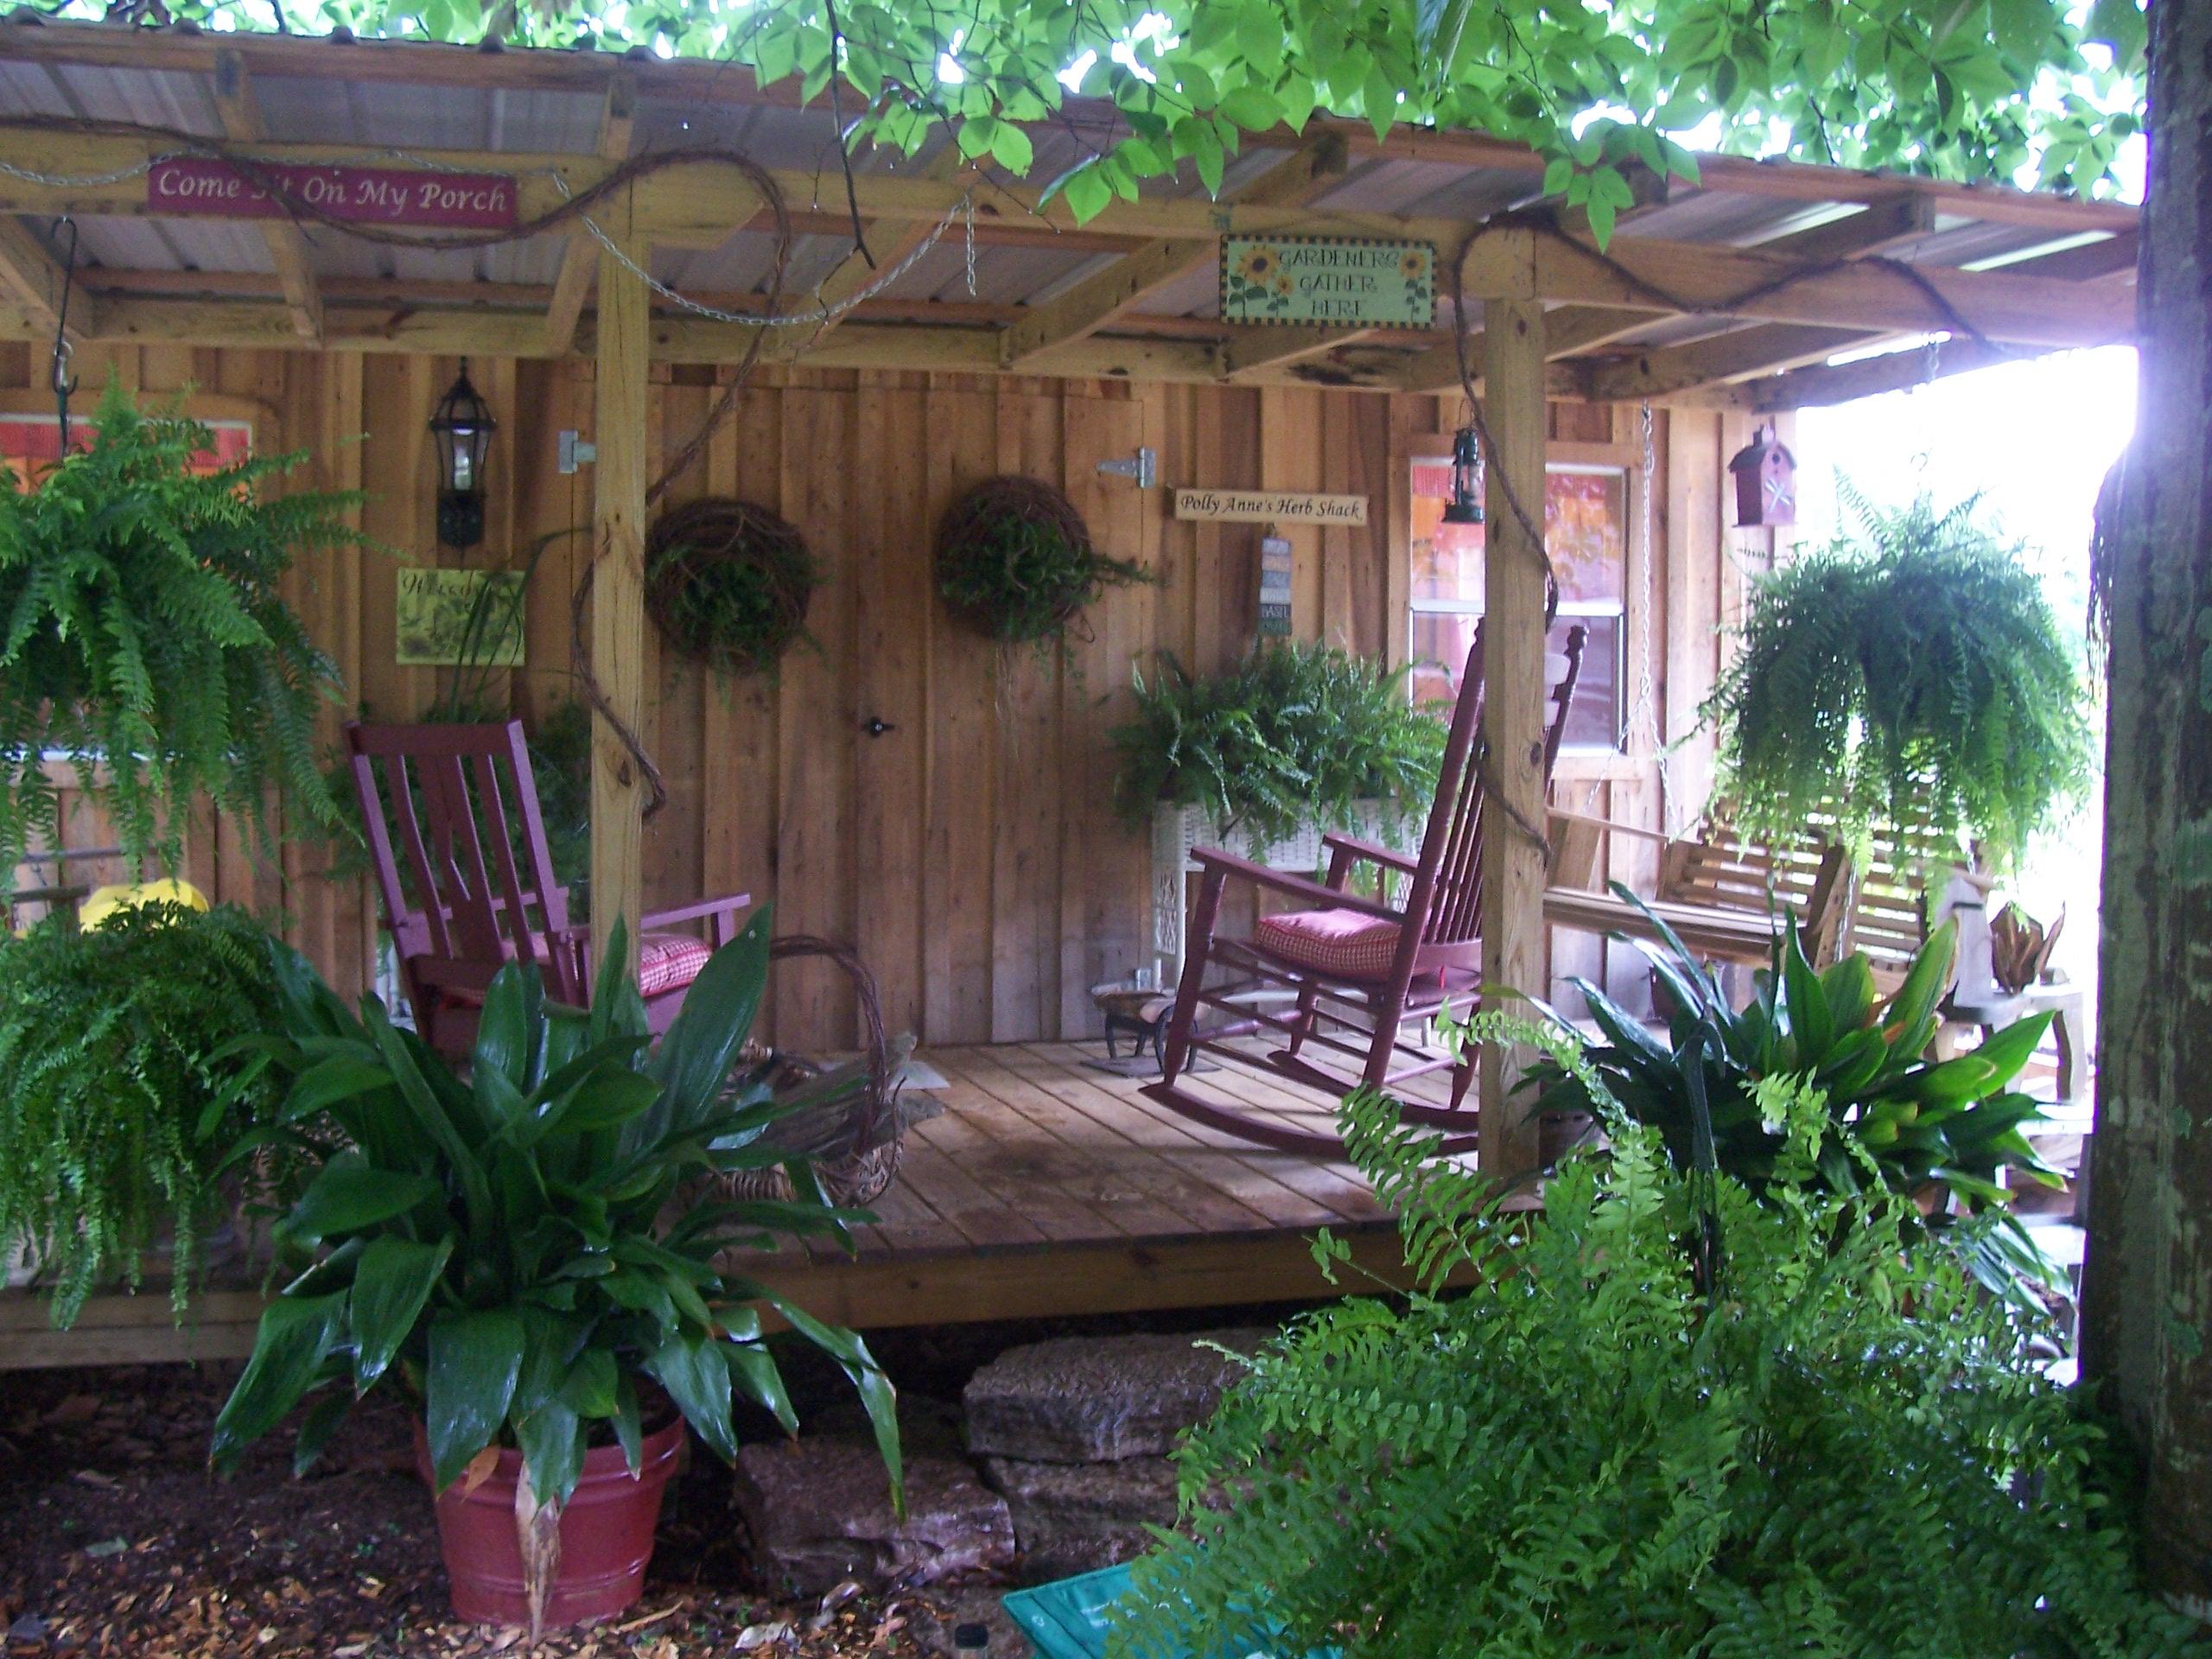 Herb shack